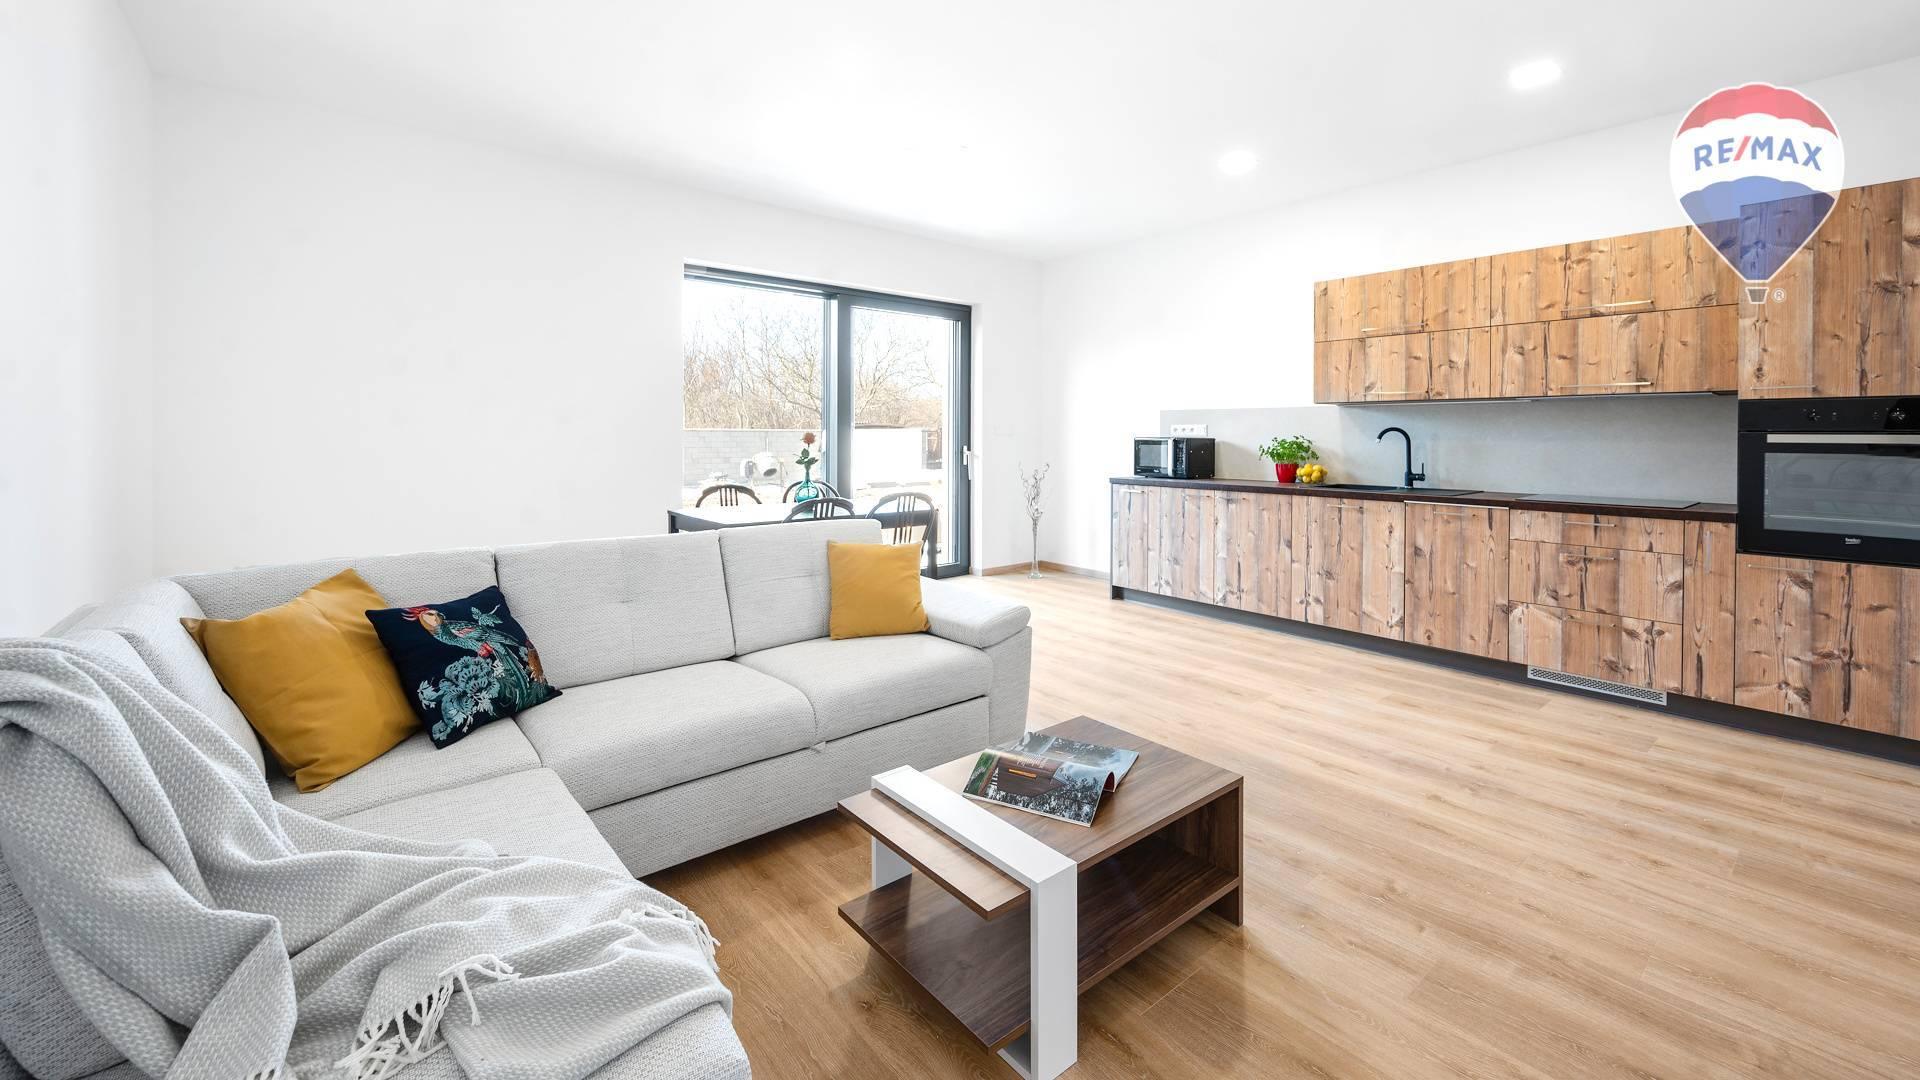 2 izbový byt v tichej lokalite Bratislava - Jarovce